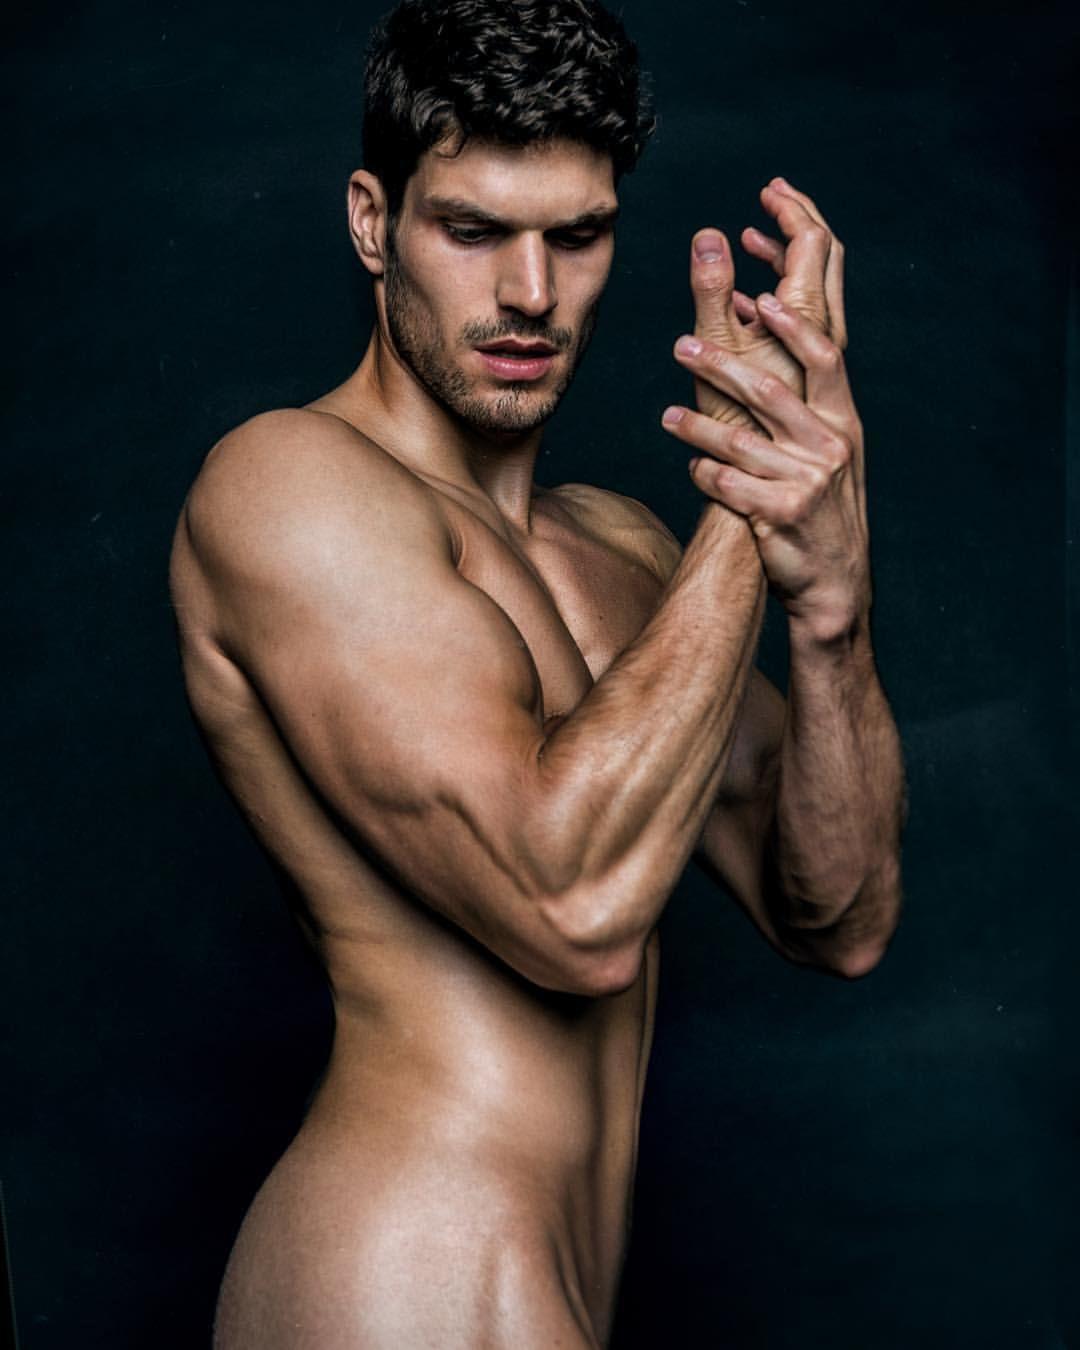 Hot asian model spread naked